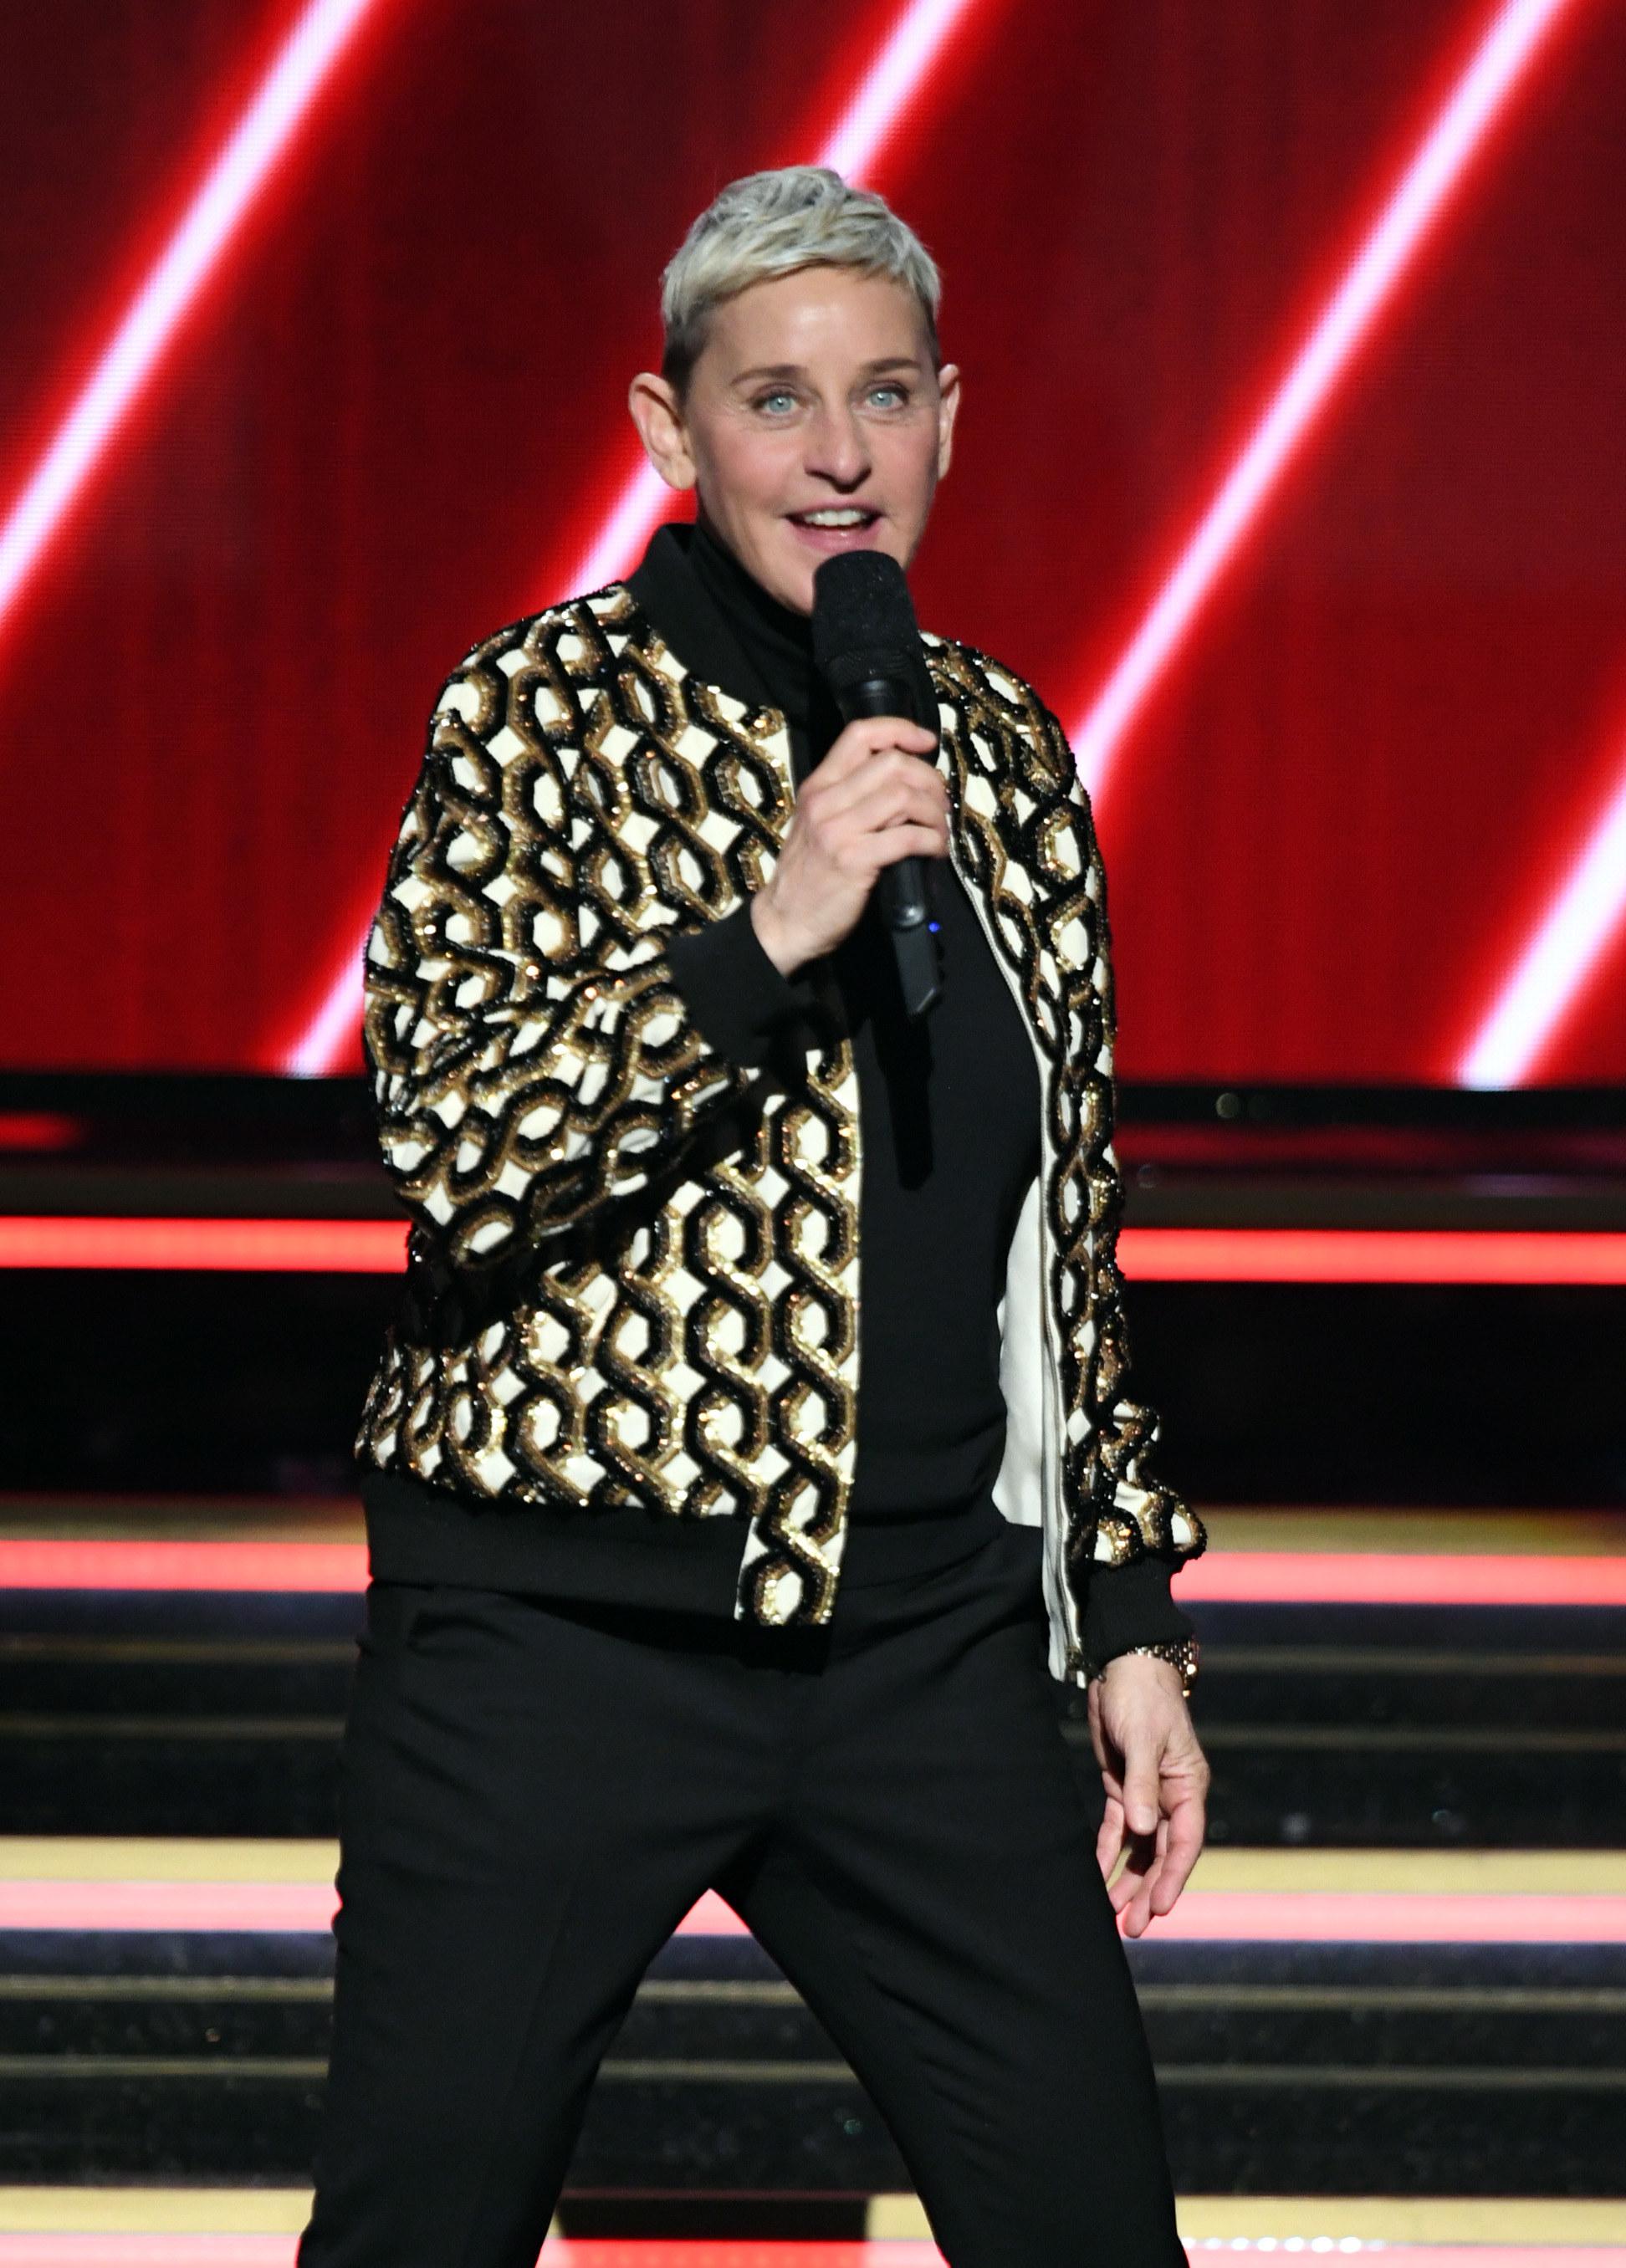 Ellen hosting